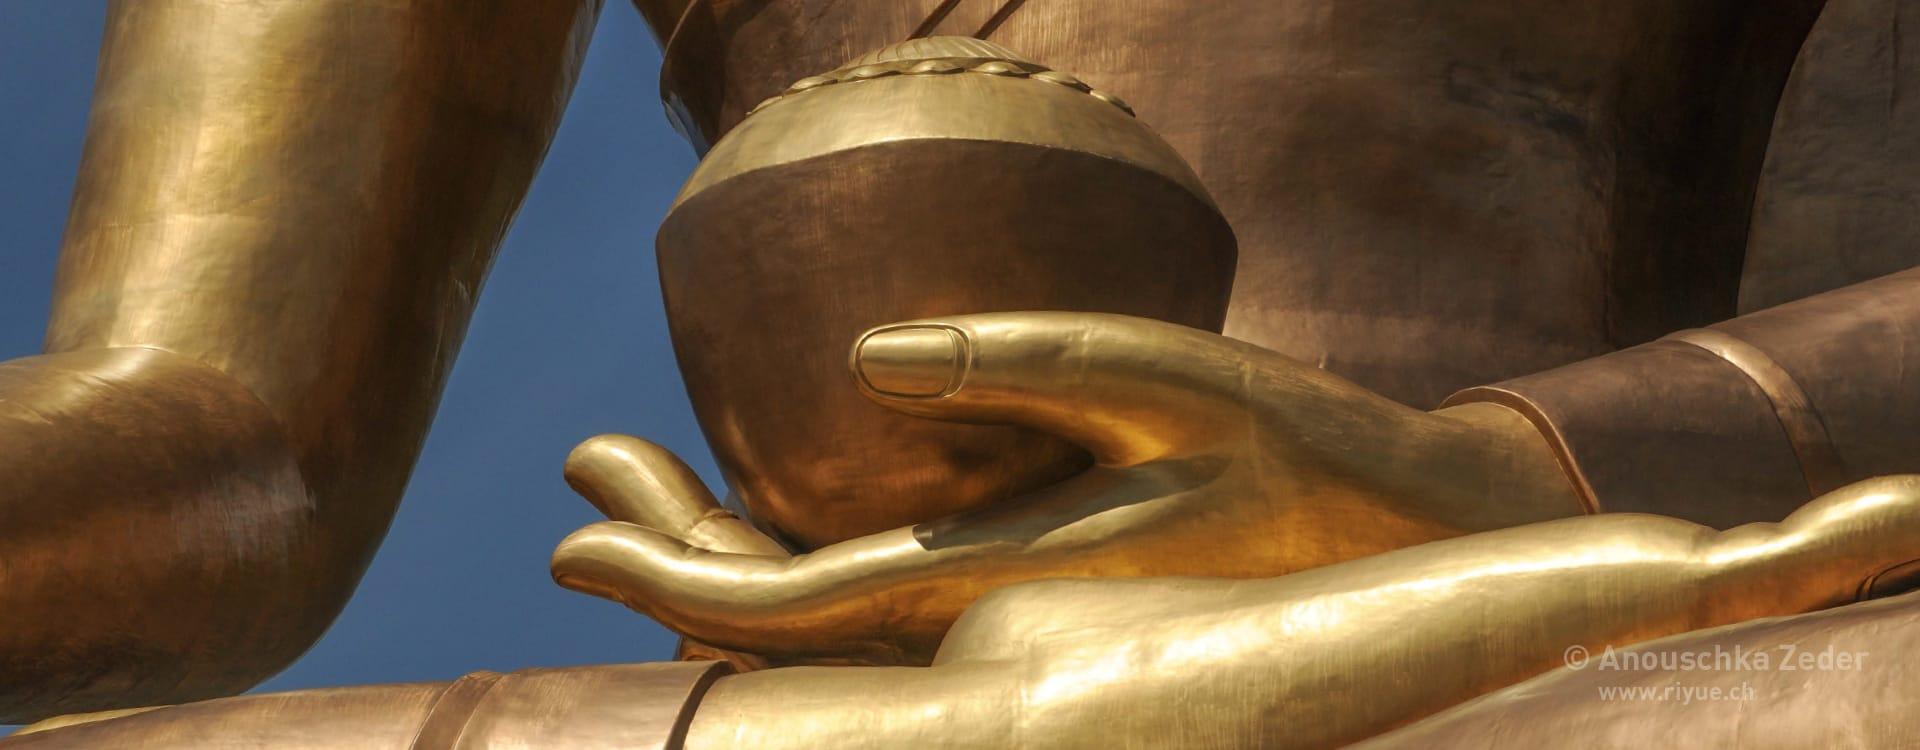 riyue – Klangbett/Monochord – Buddha Bhutan